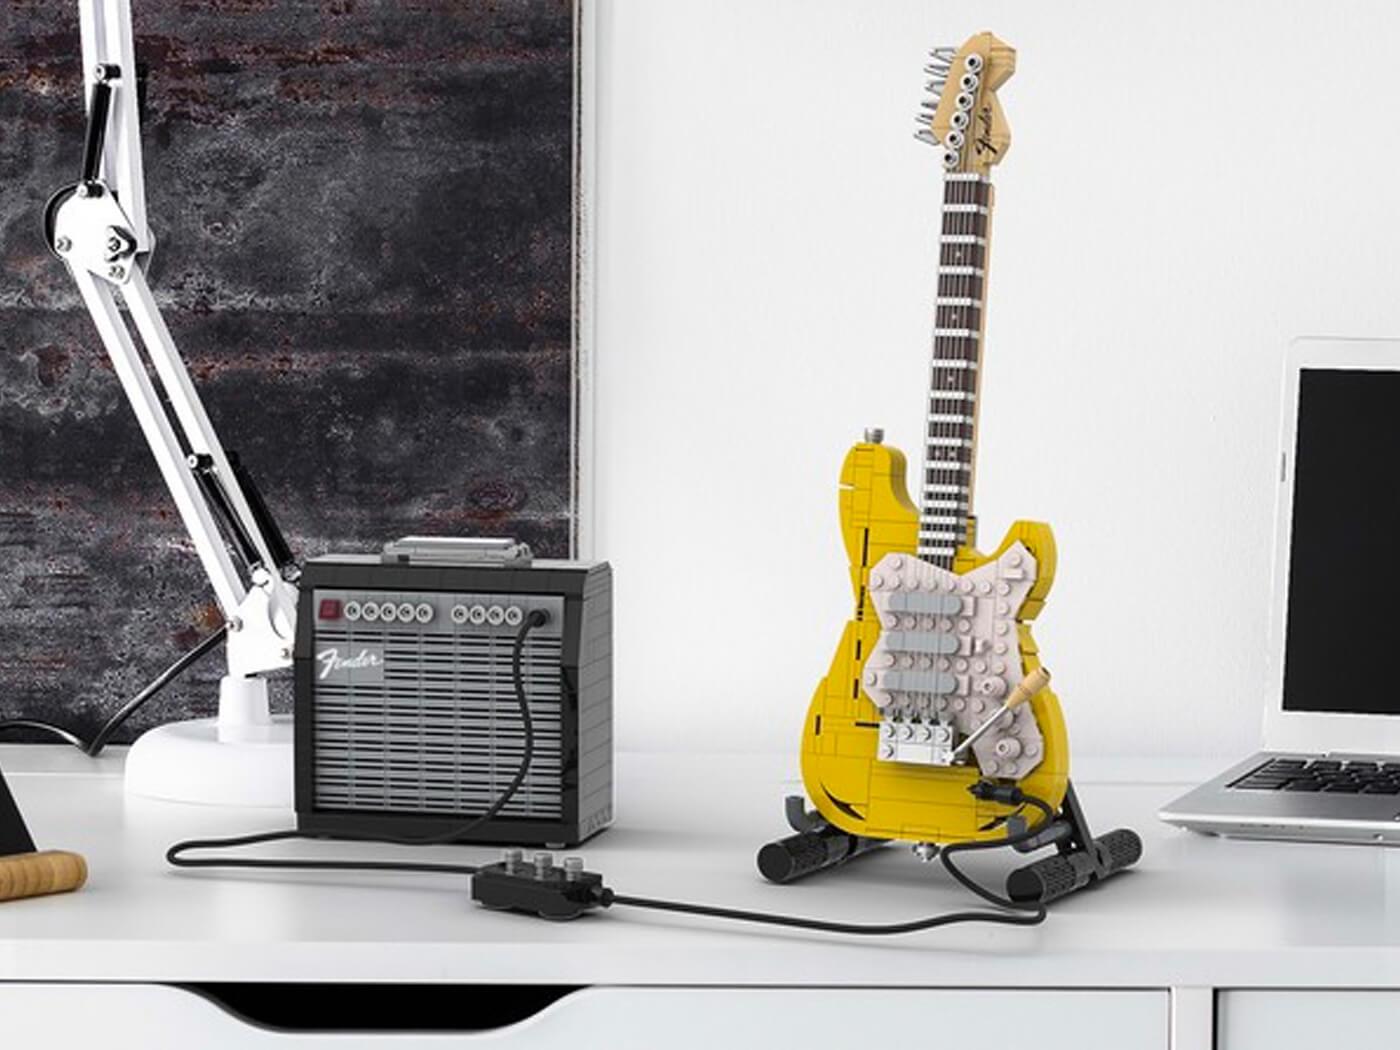 LEGO Stratocaster